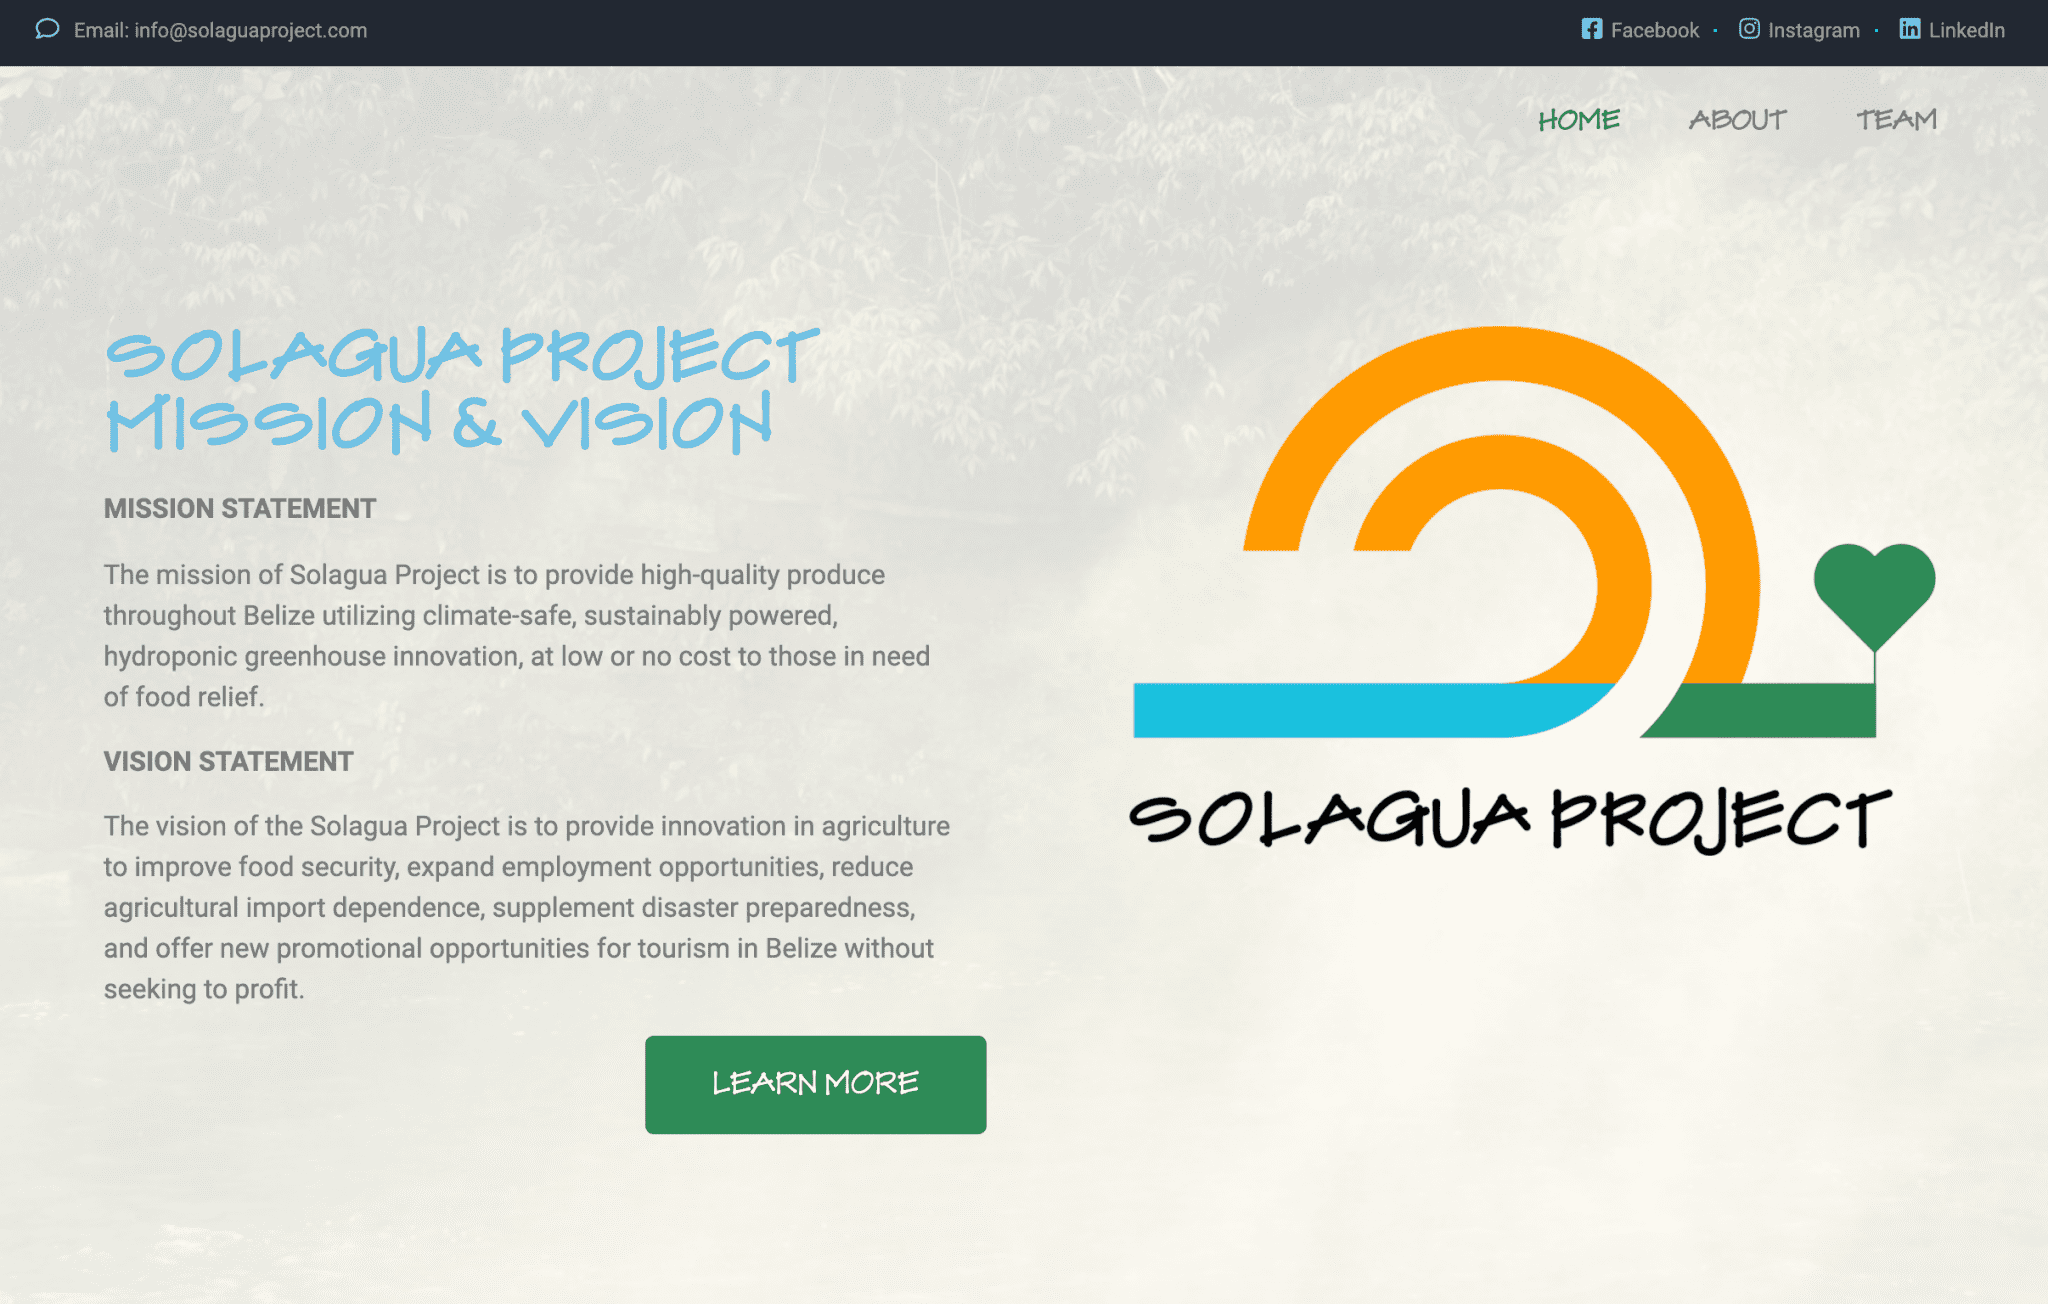 Solagua Project